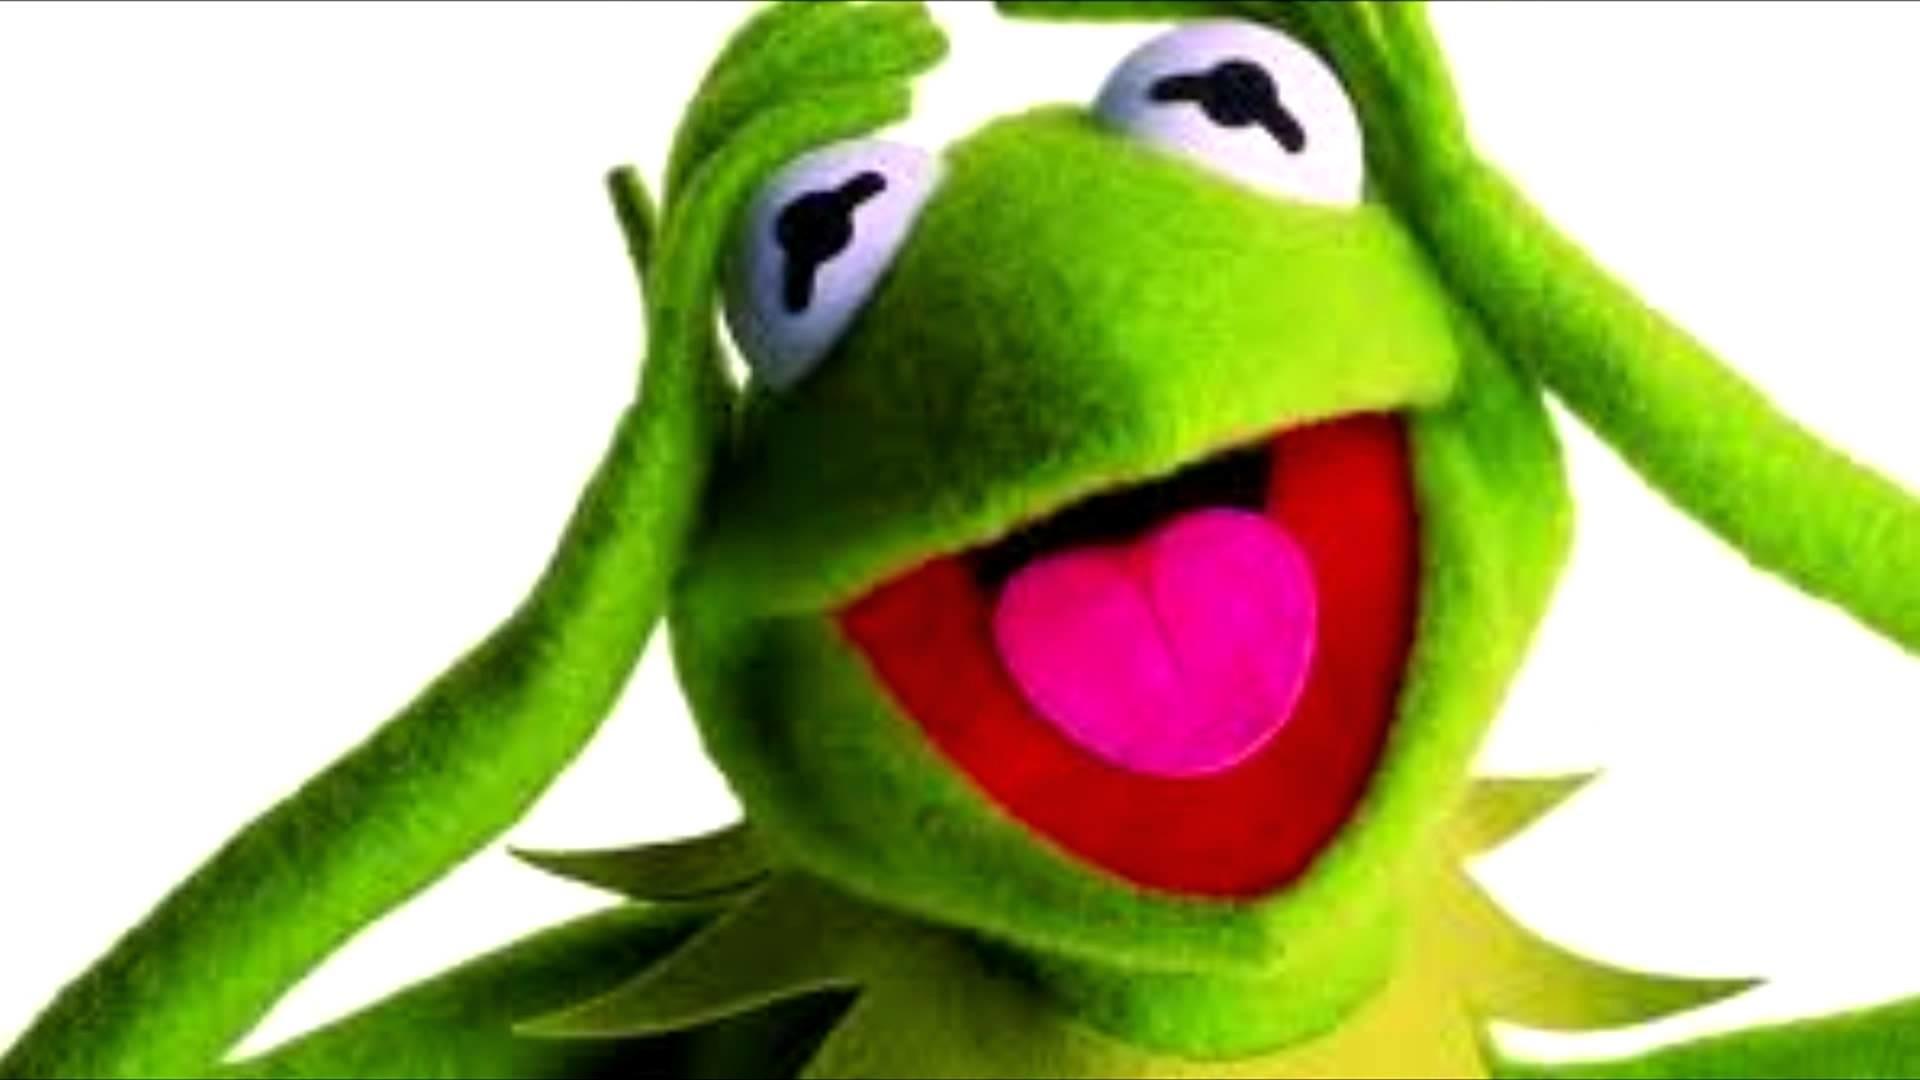 Kermit The Frog Wallpaper 53 Images